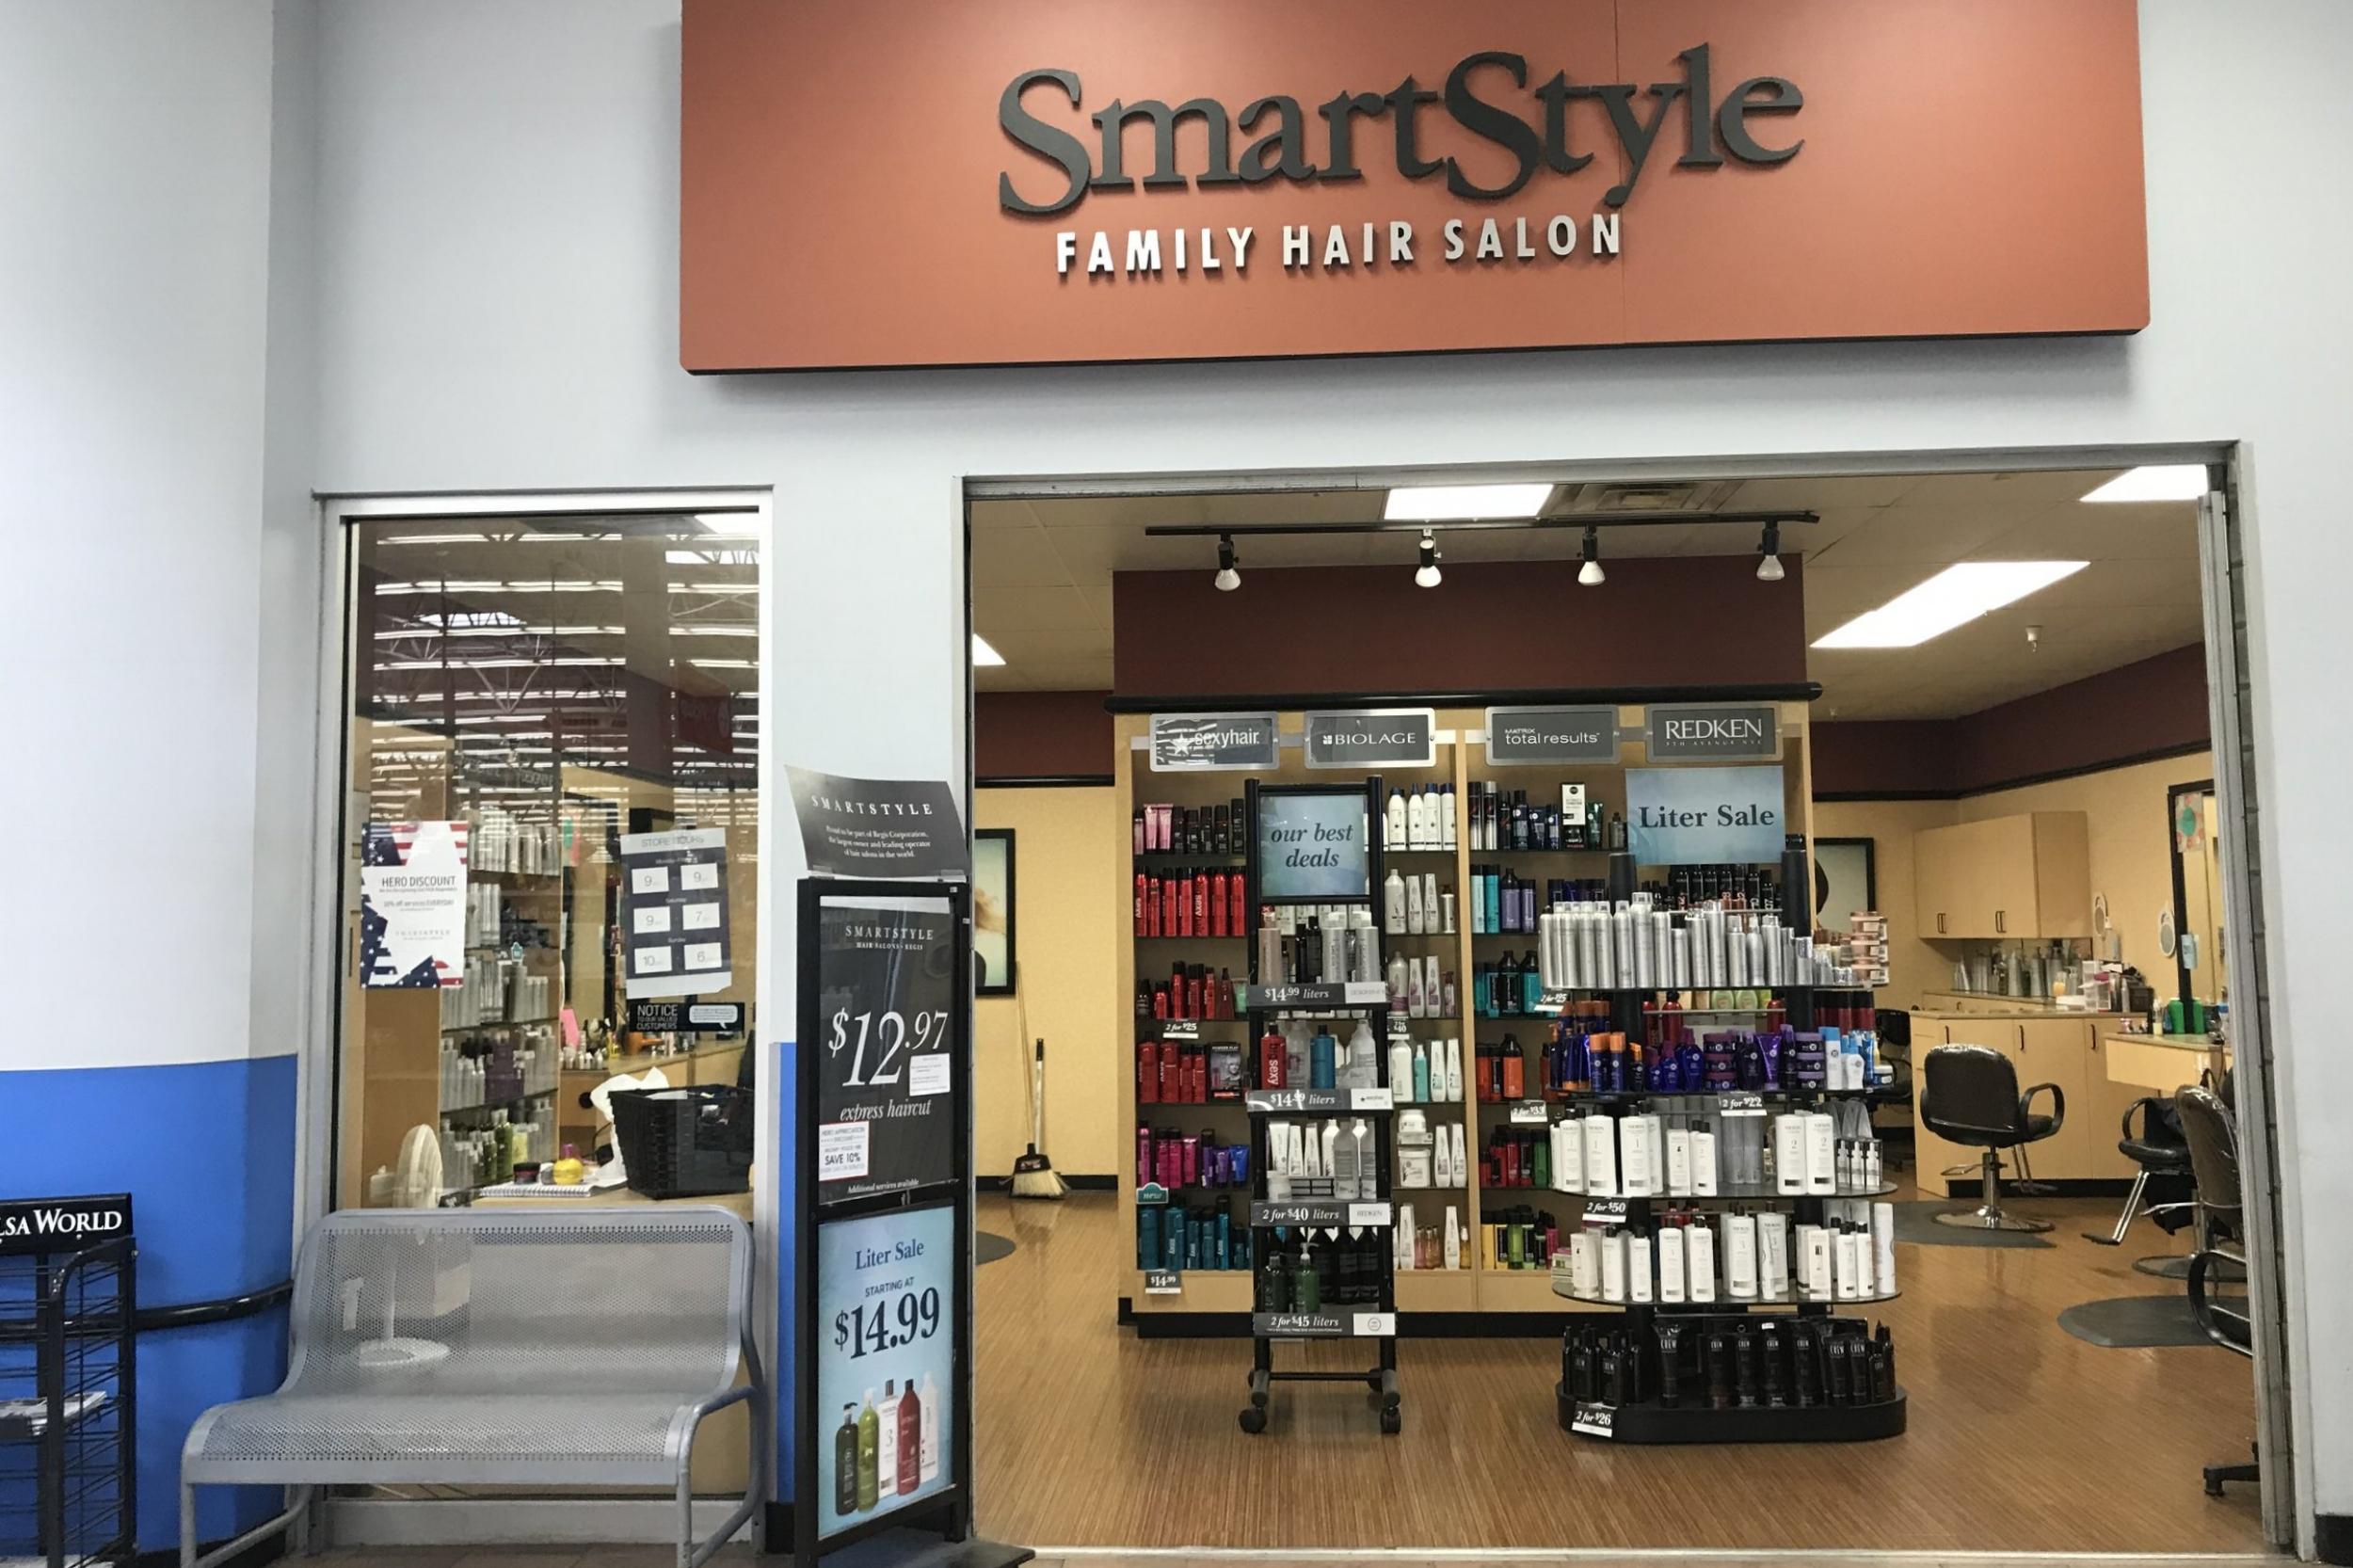 smartstyle hair salon - inside walmart 220 ok-97